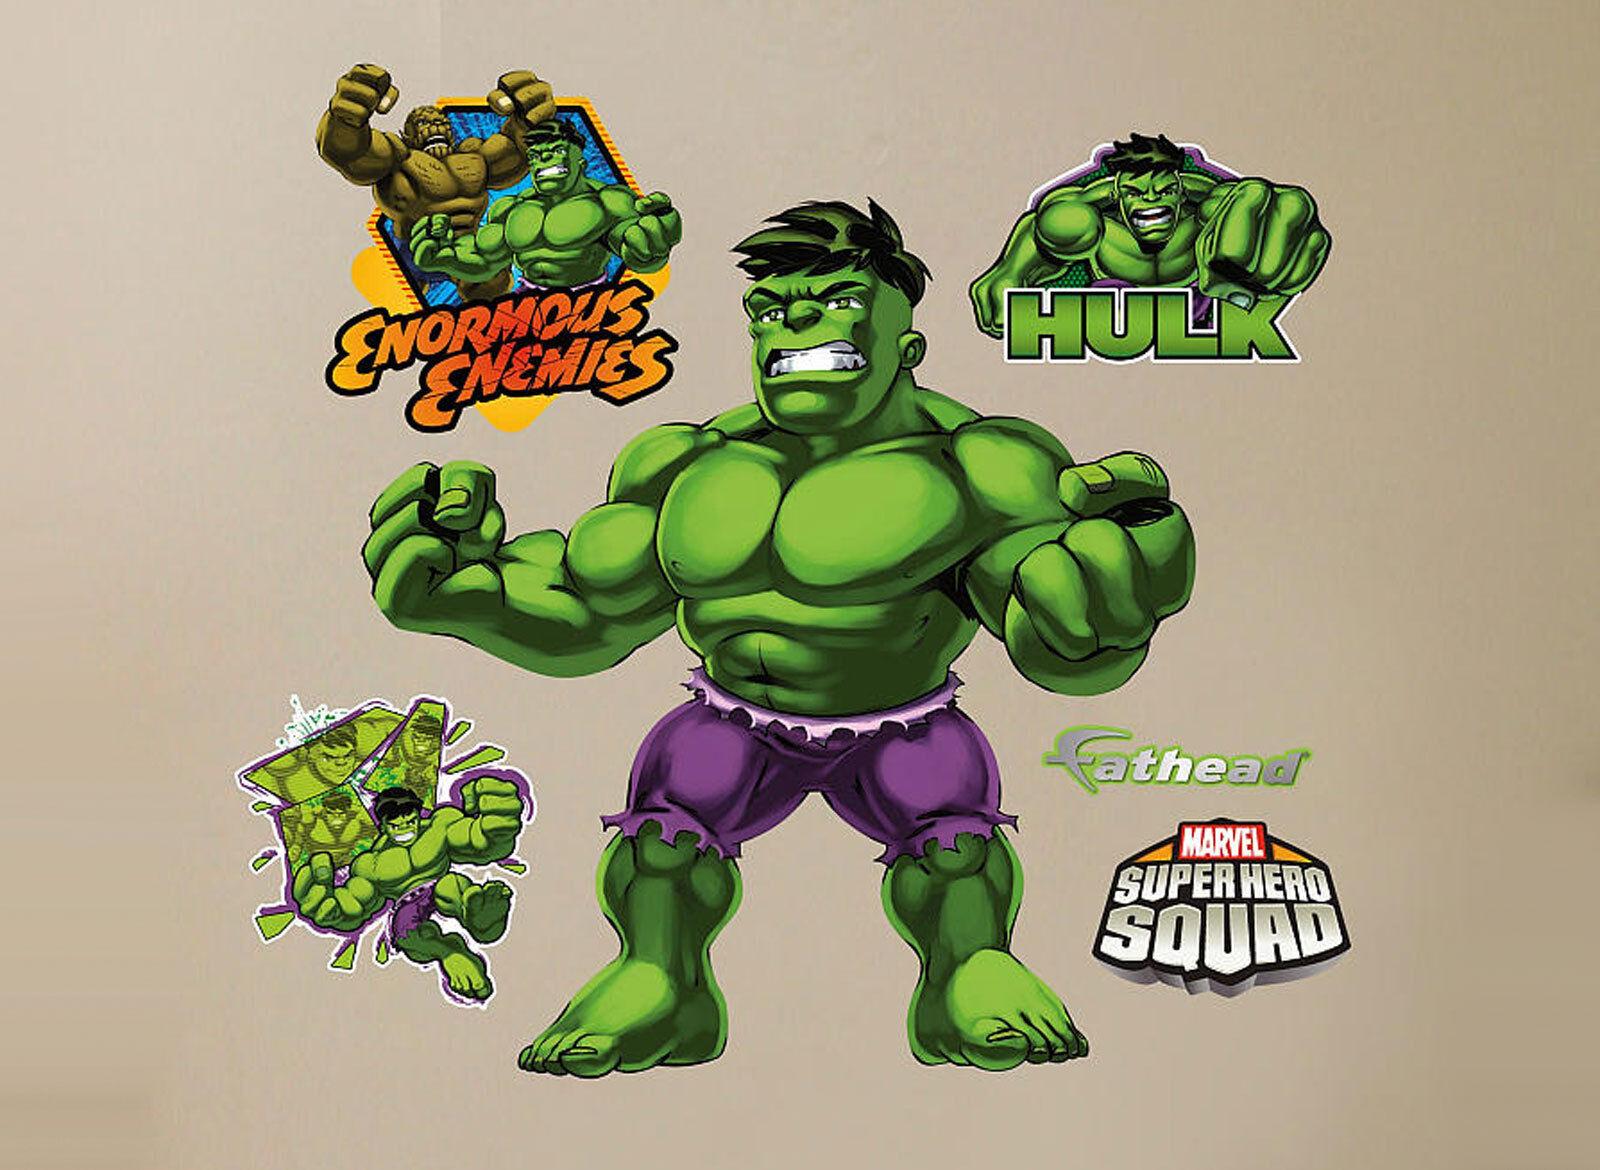 Fathead Super Hero Squad De Hulk Marvel Comics parojo decoración nuevo 96-96060